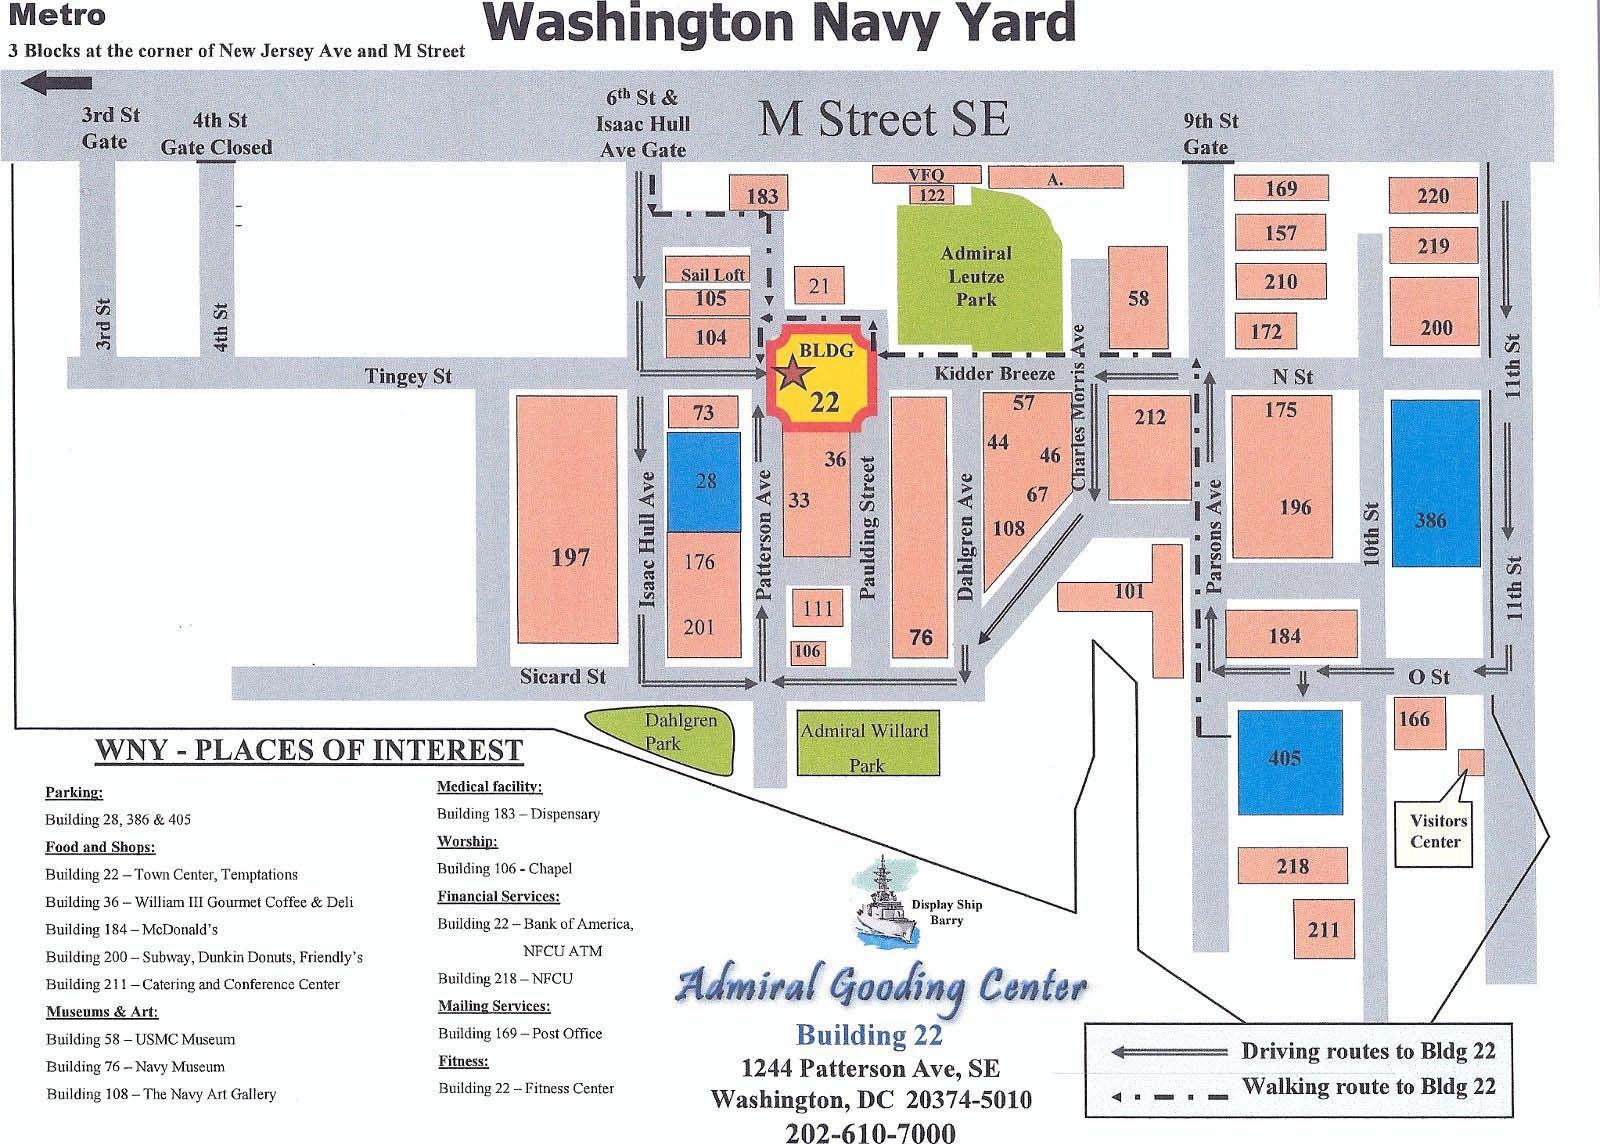 washington navy yard black single men Fojlowing the tragic shooting at the washington navy yard on september 16,  centralize authority, accountability and programmatic integration under a single.